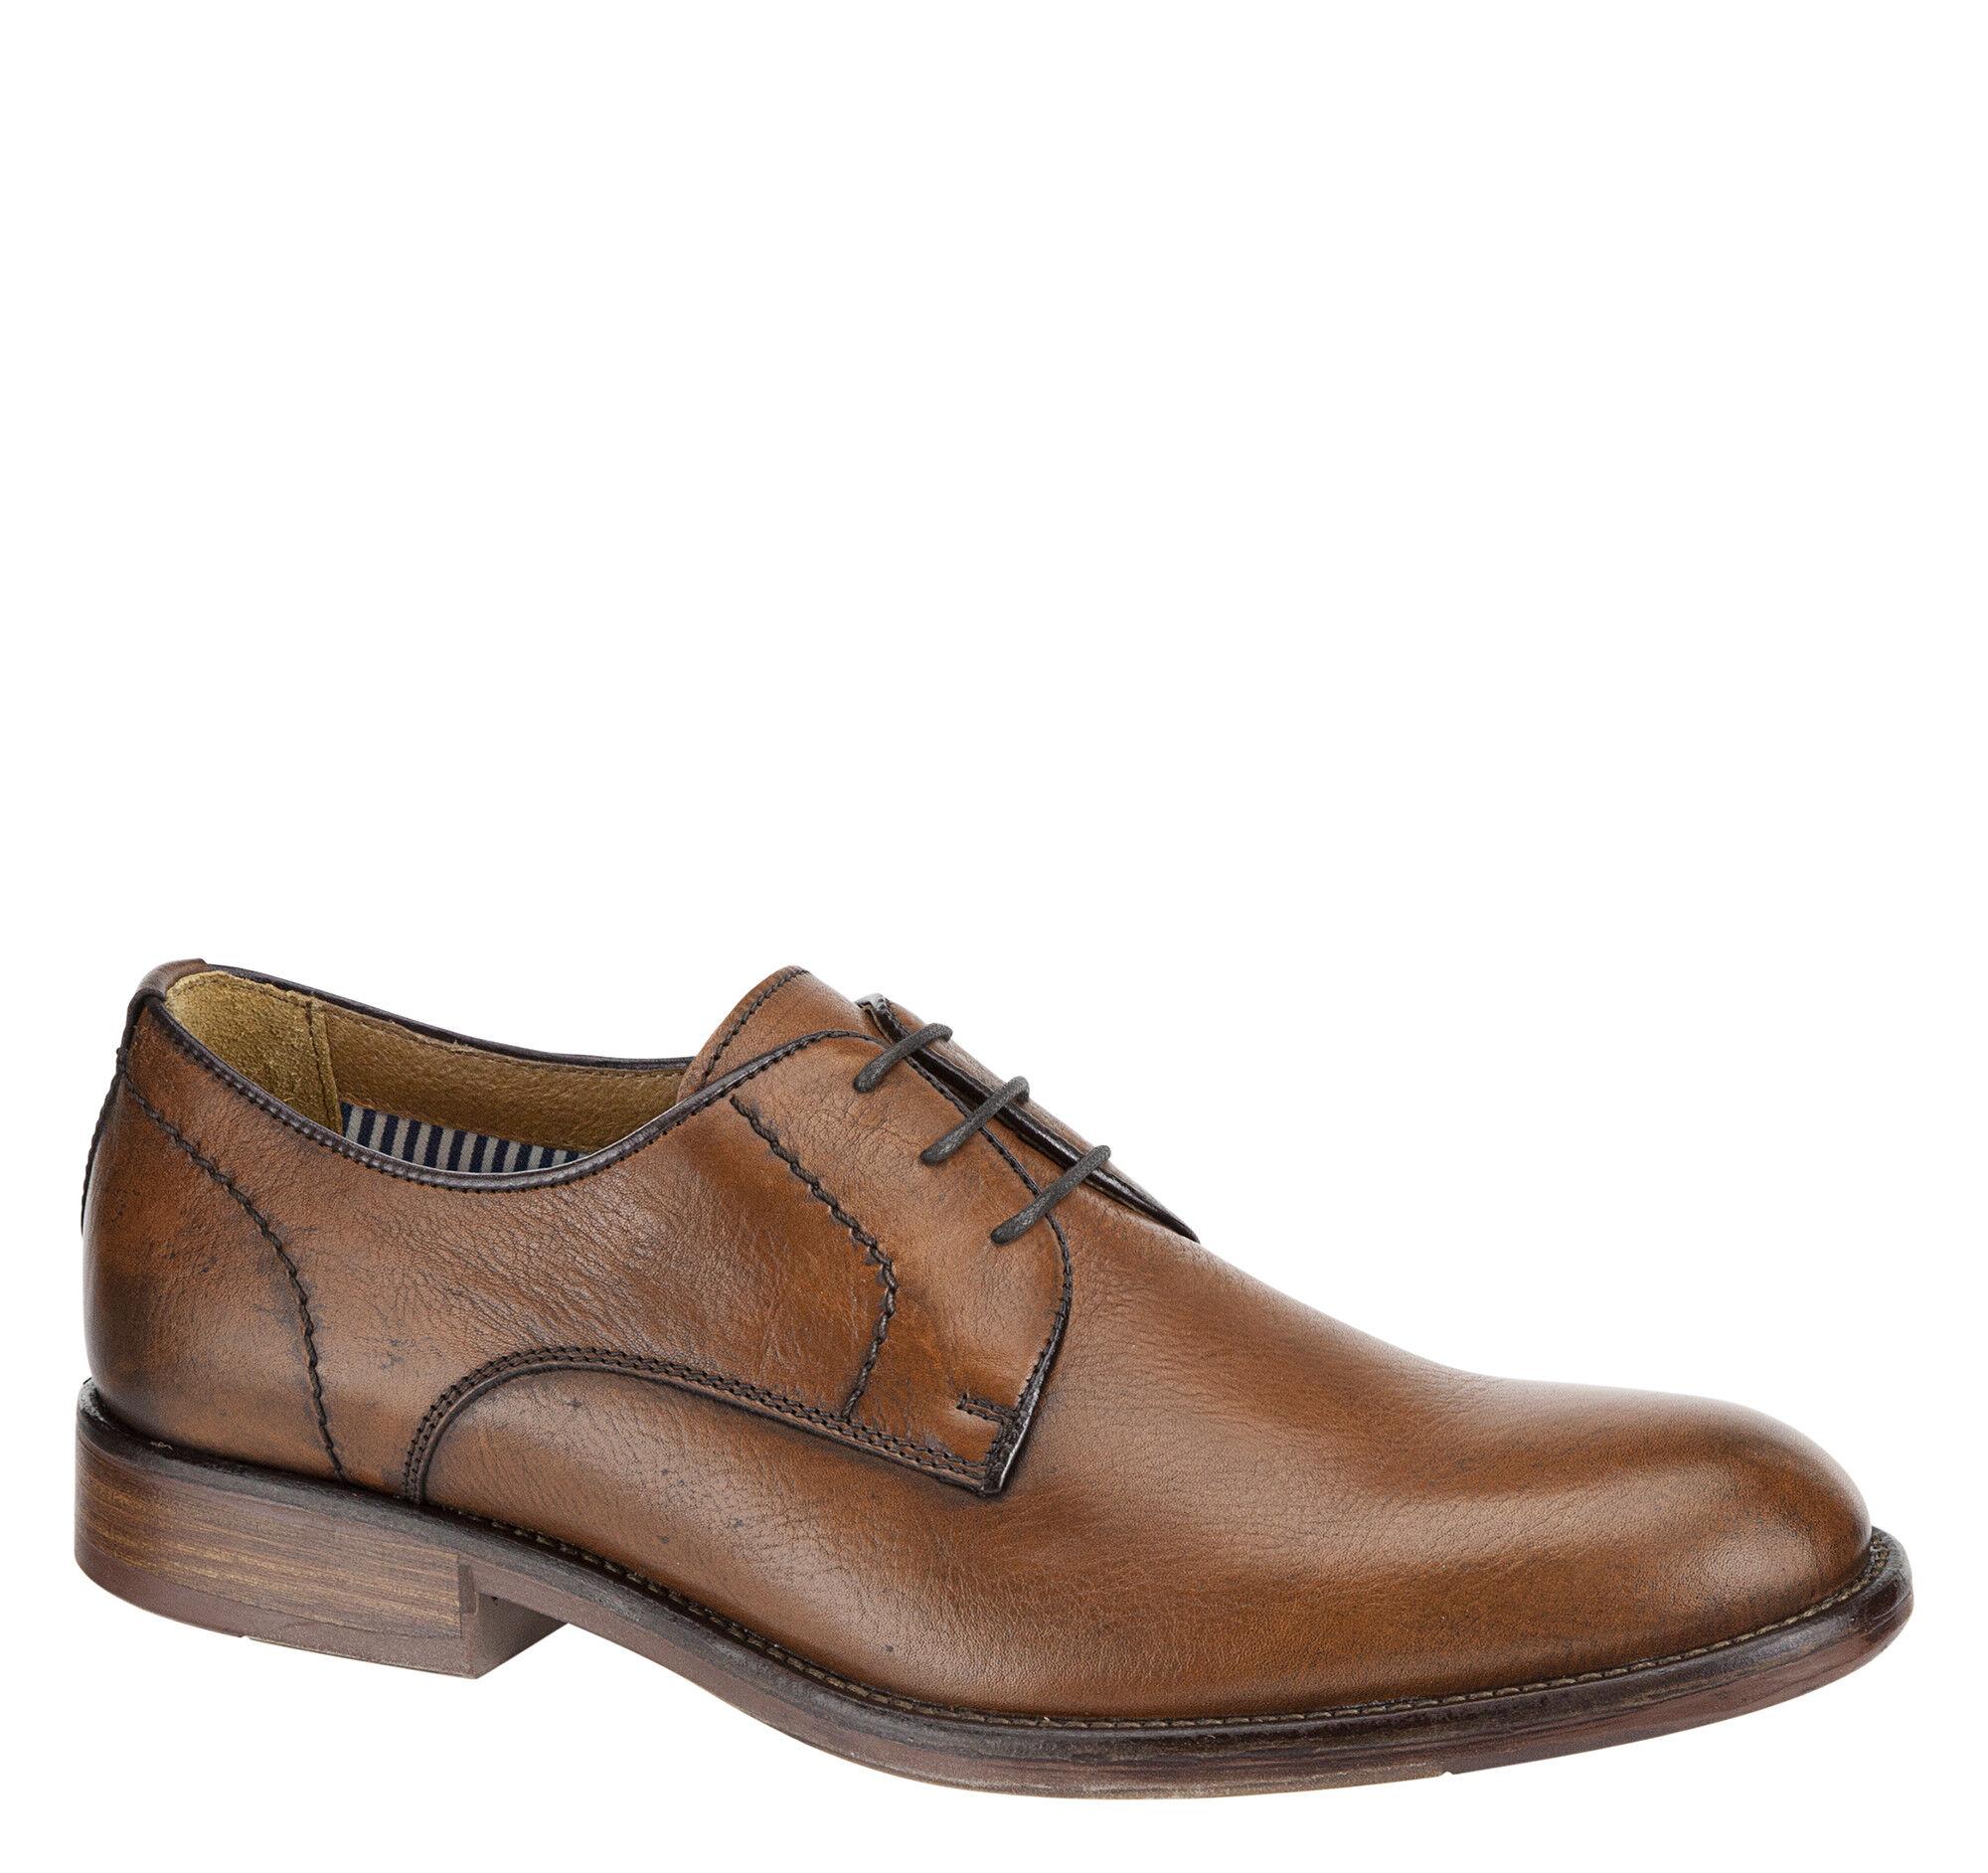 Johnston And Murphy Shoes Australia